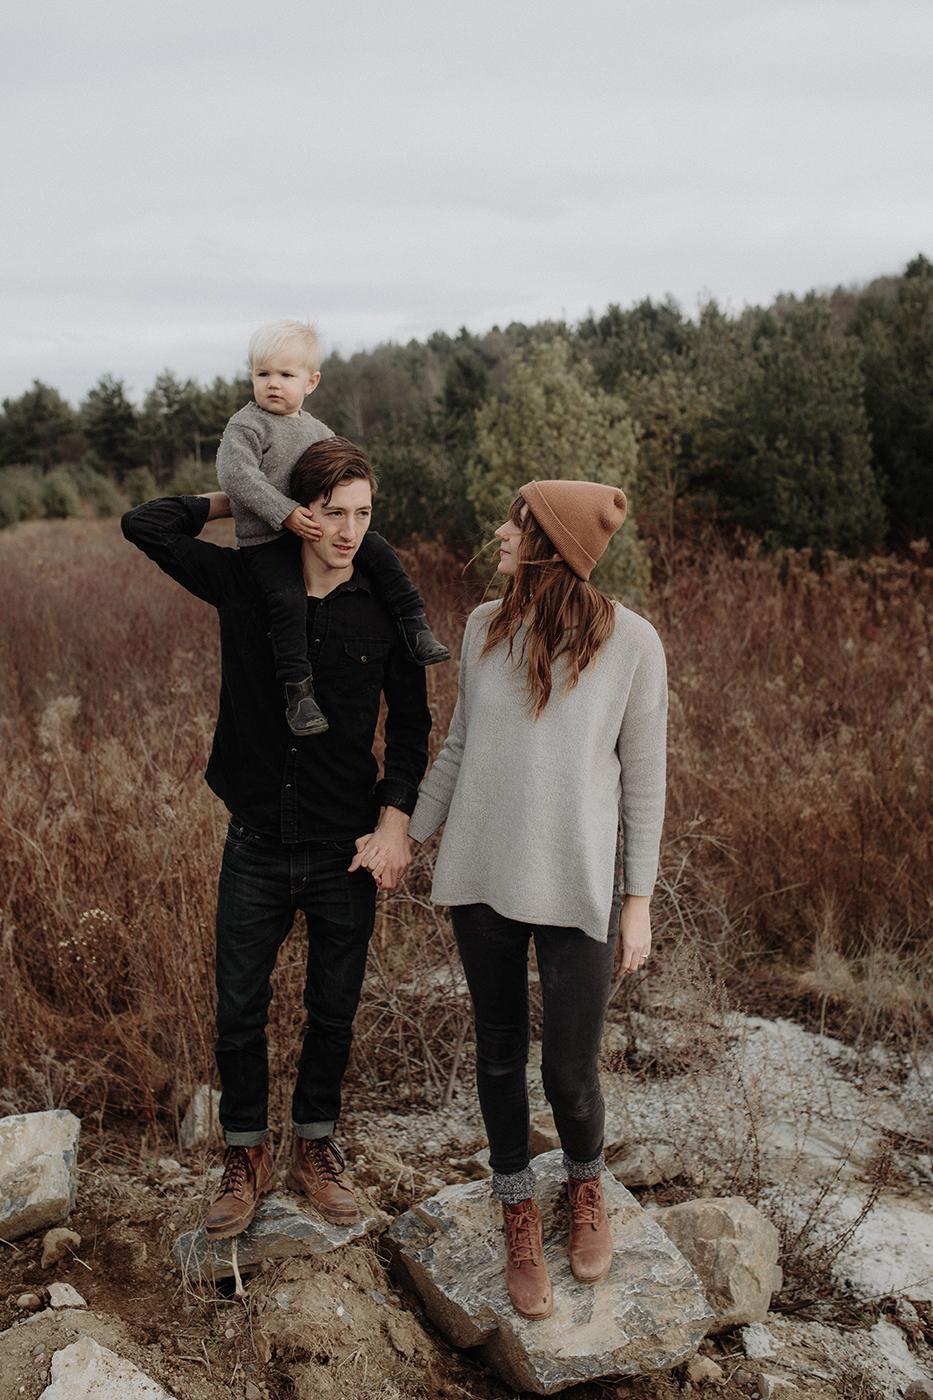 dudash-family-46-web.jpg